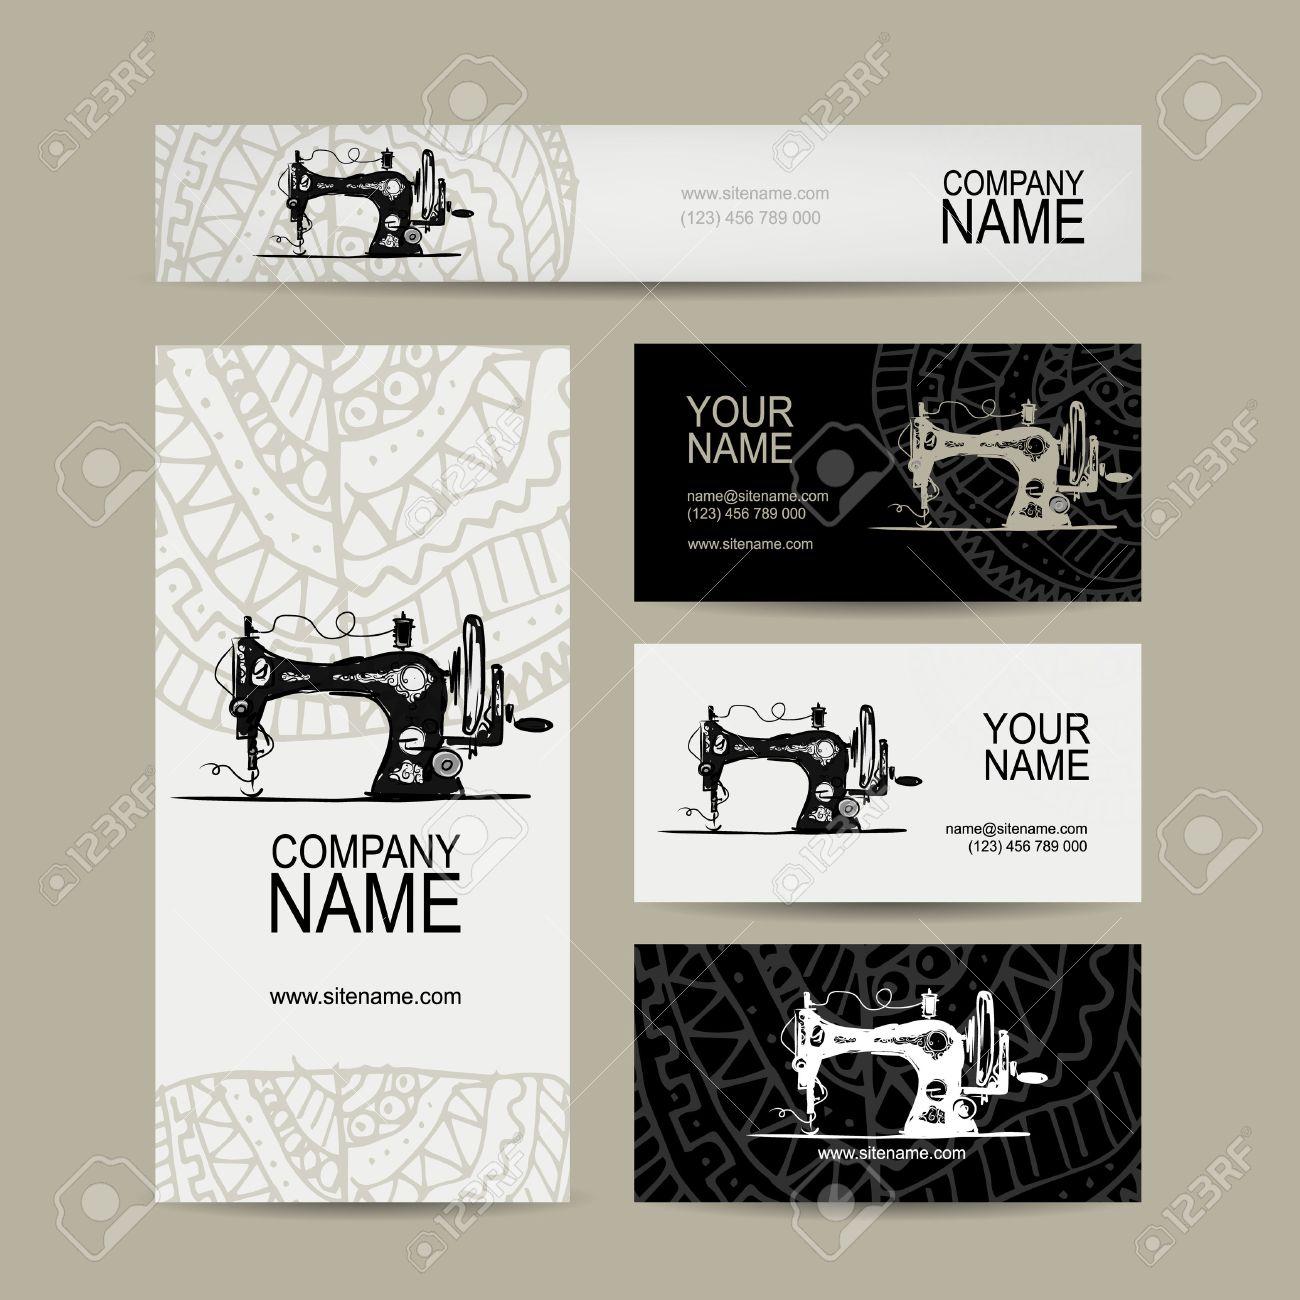 Business Cards Design, Sewing Maschine Sketch, Vector Illustration ...